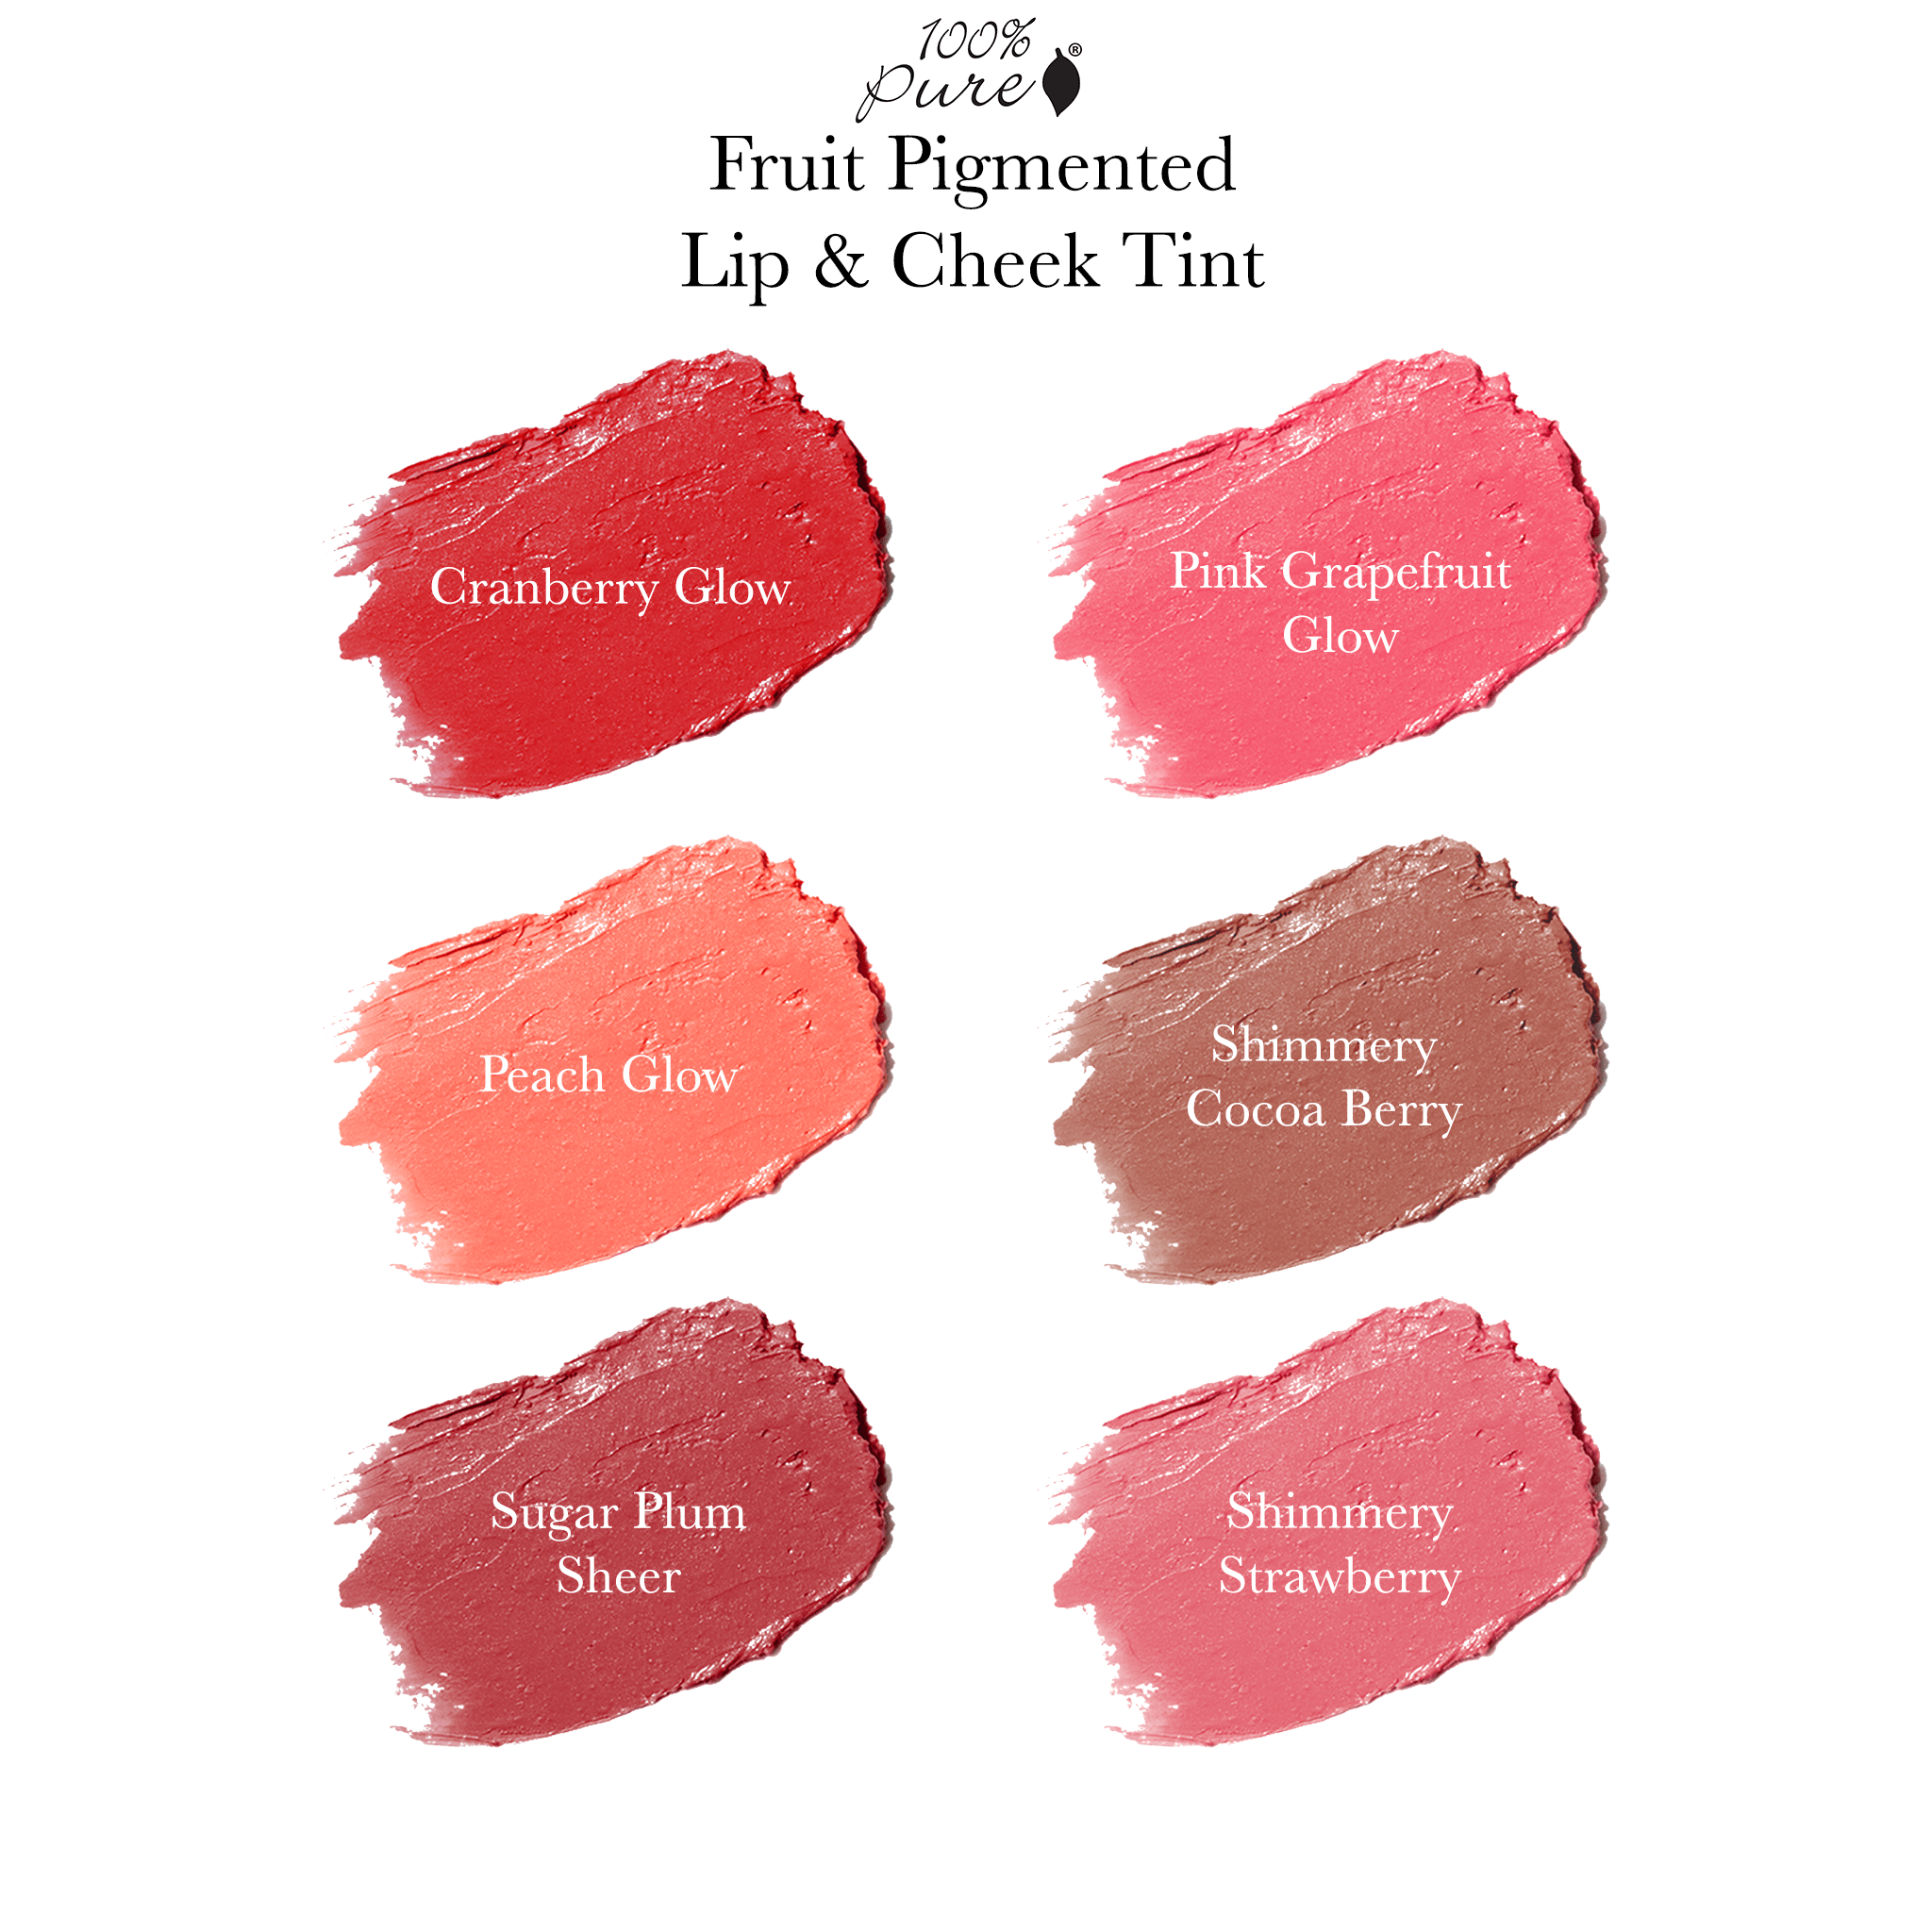 Fruit Pigmented® Lip & Cheek Tint